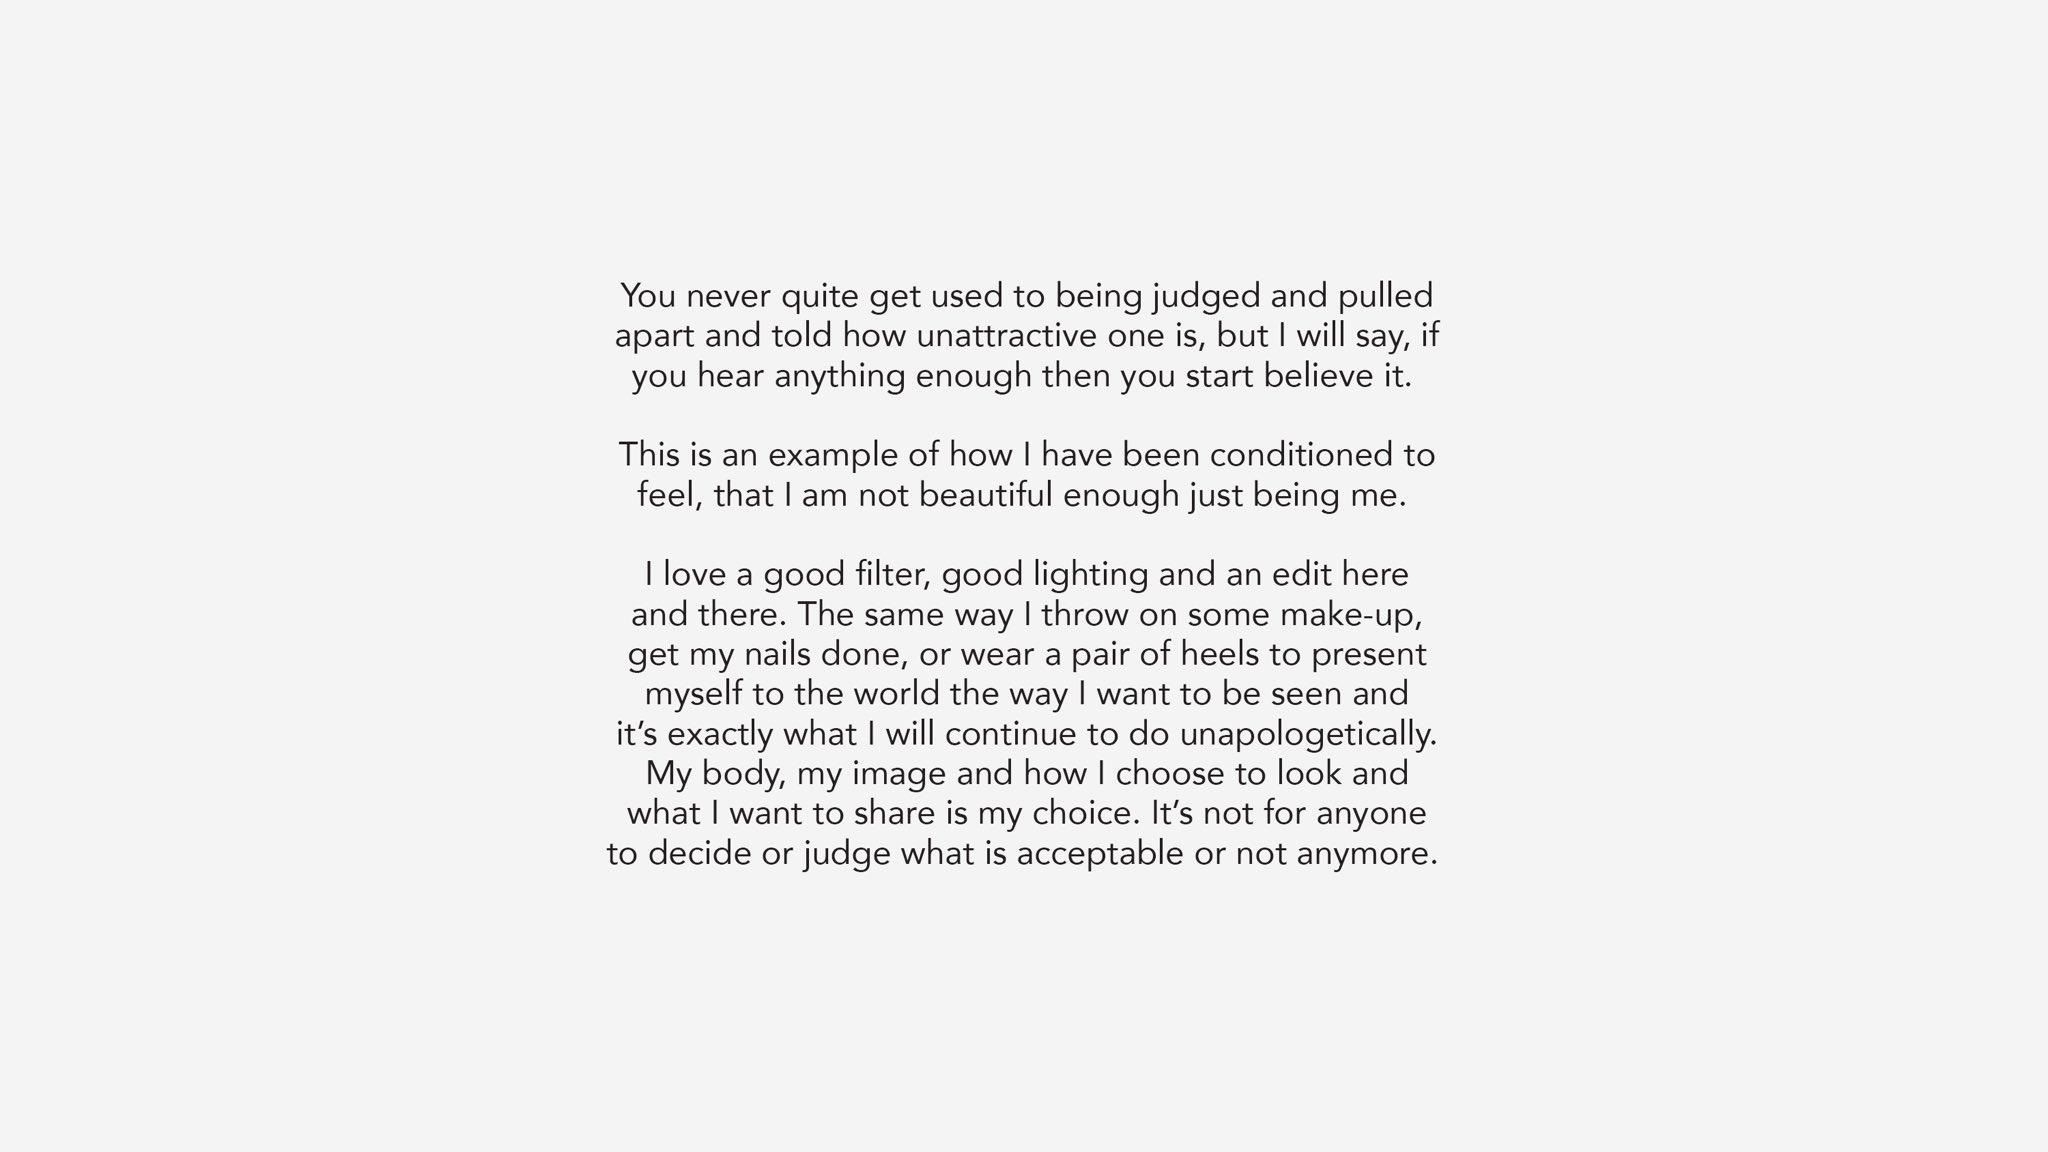 khloe kardashian statement on unedited bikini photo